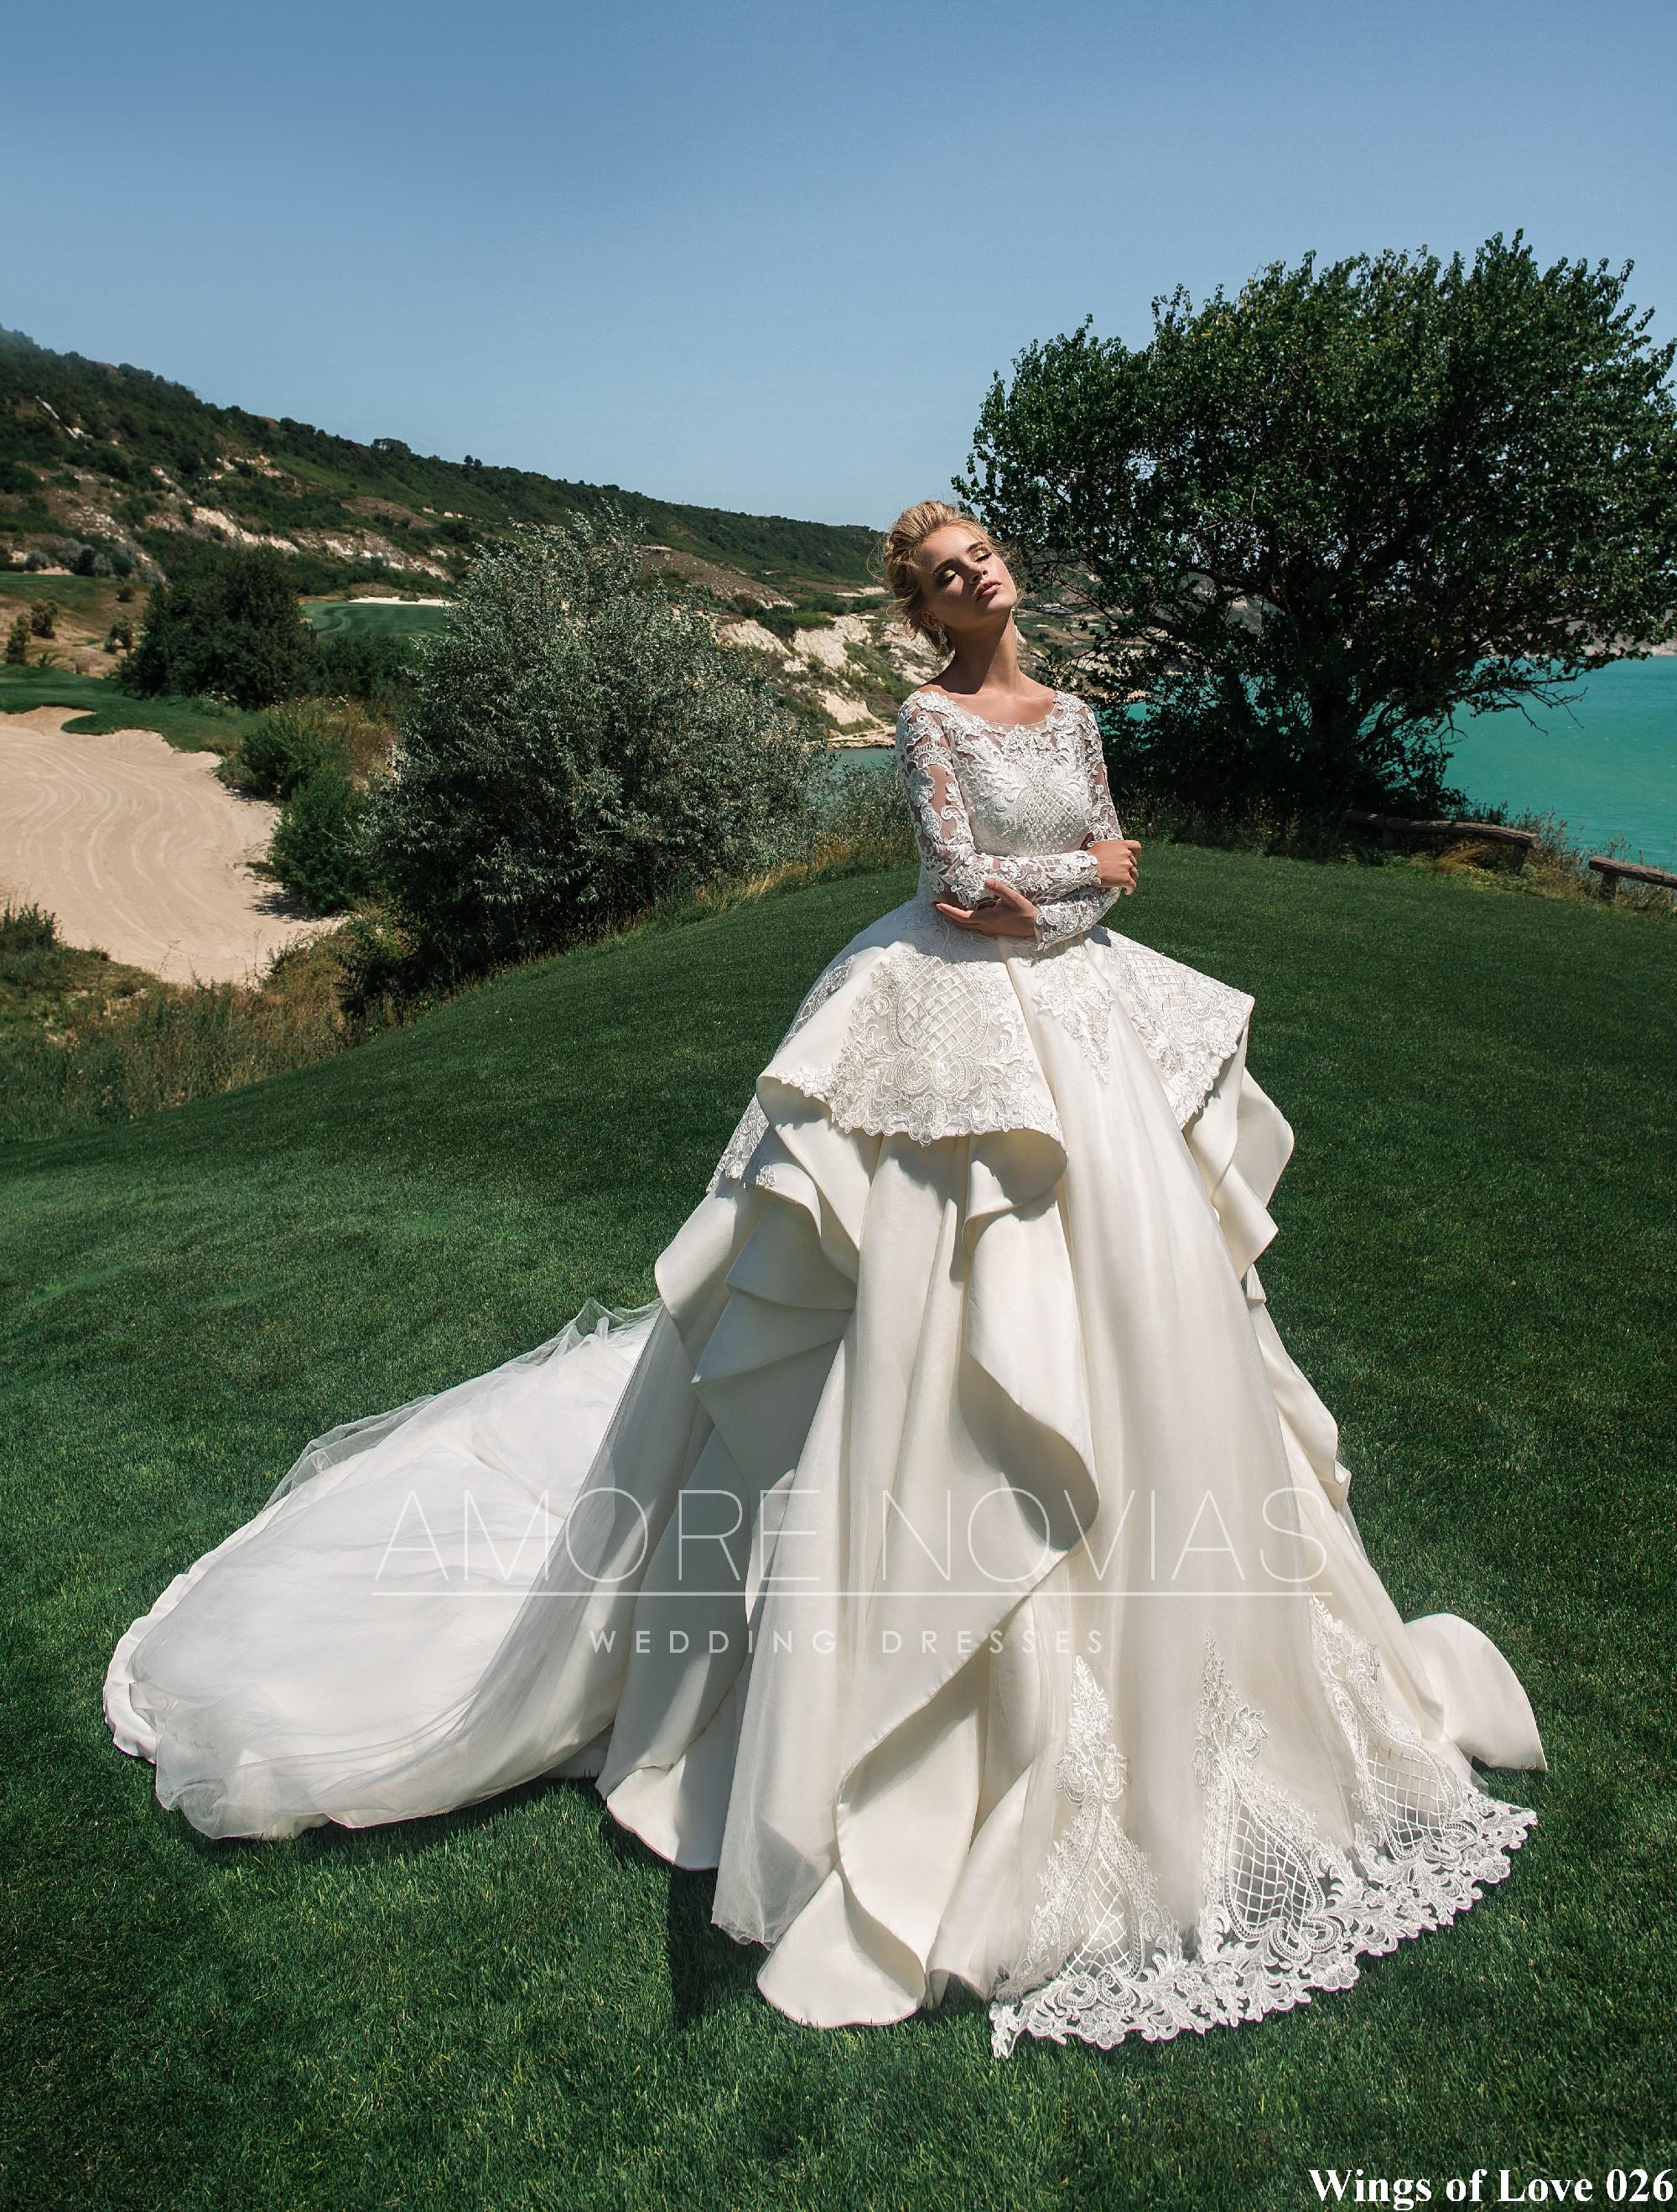 https://amore-novias.com/images/stories/virtuemart/product/lk-026-------(1).jpg